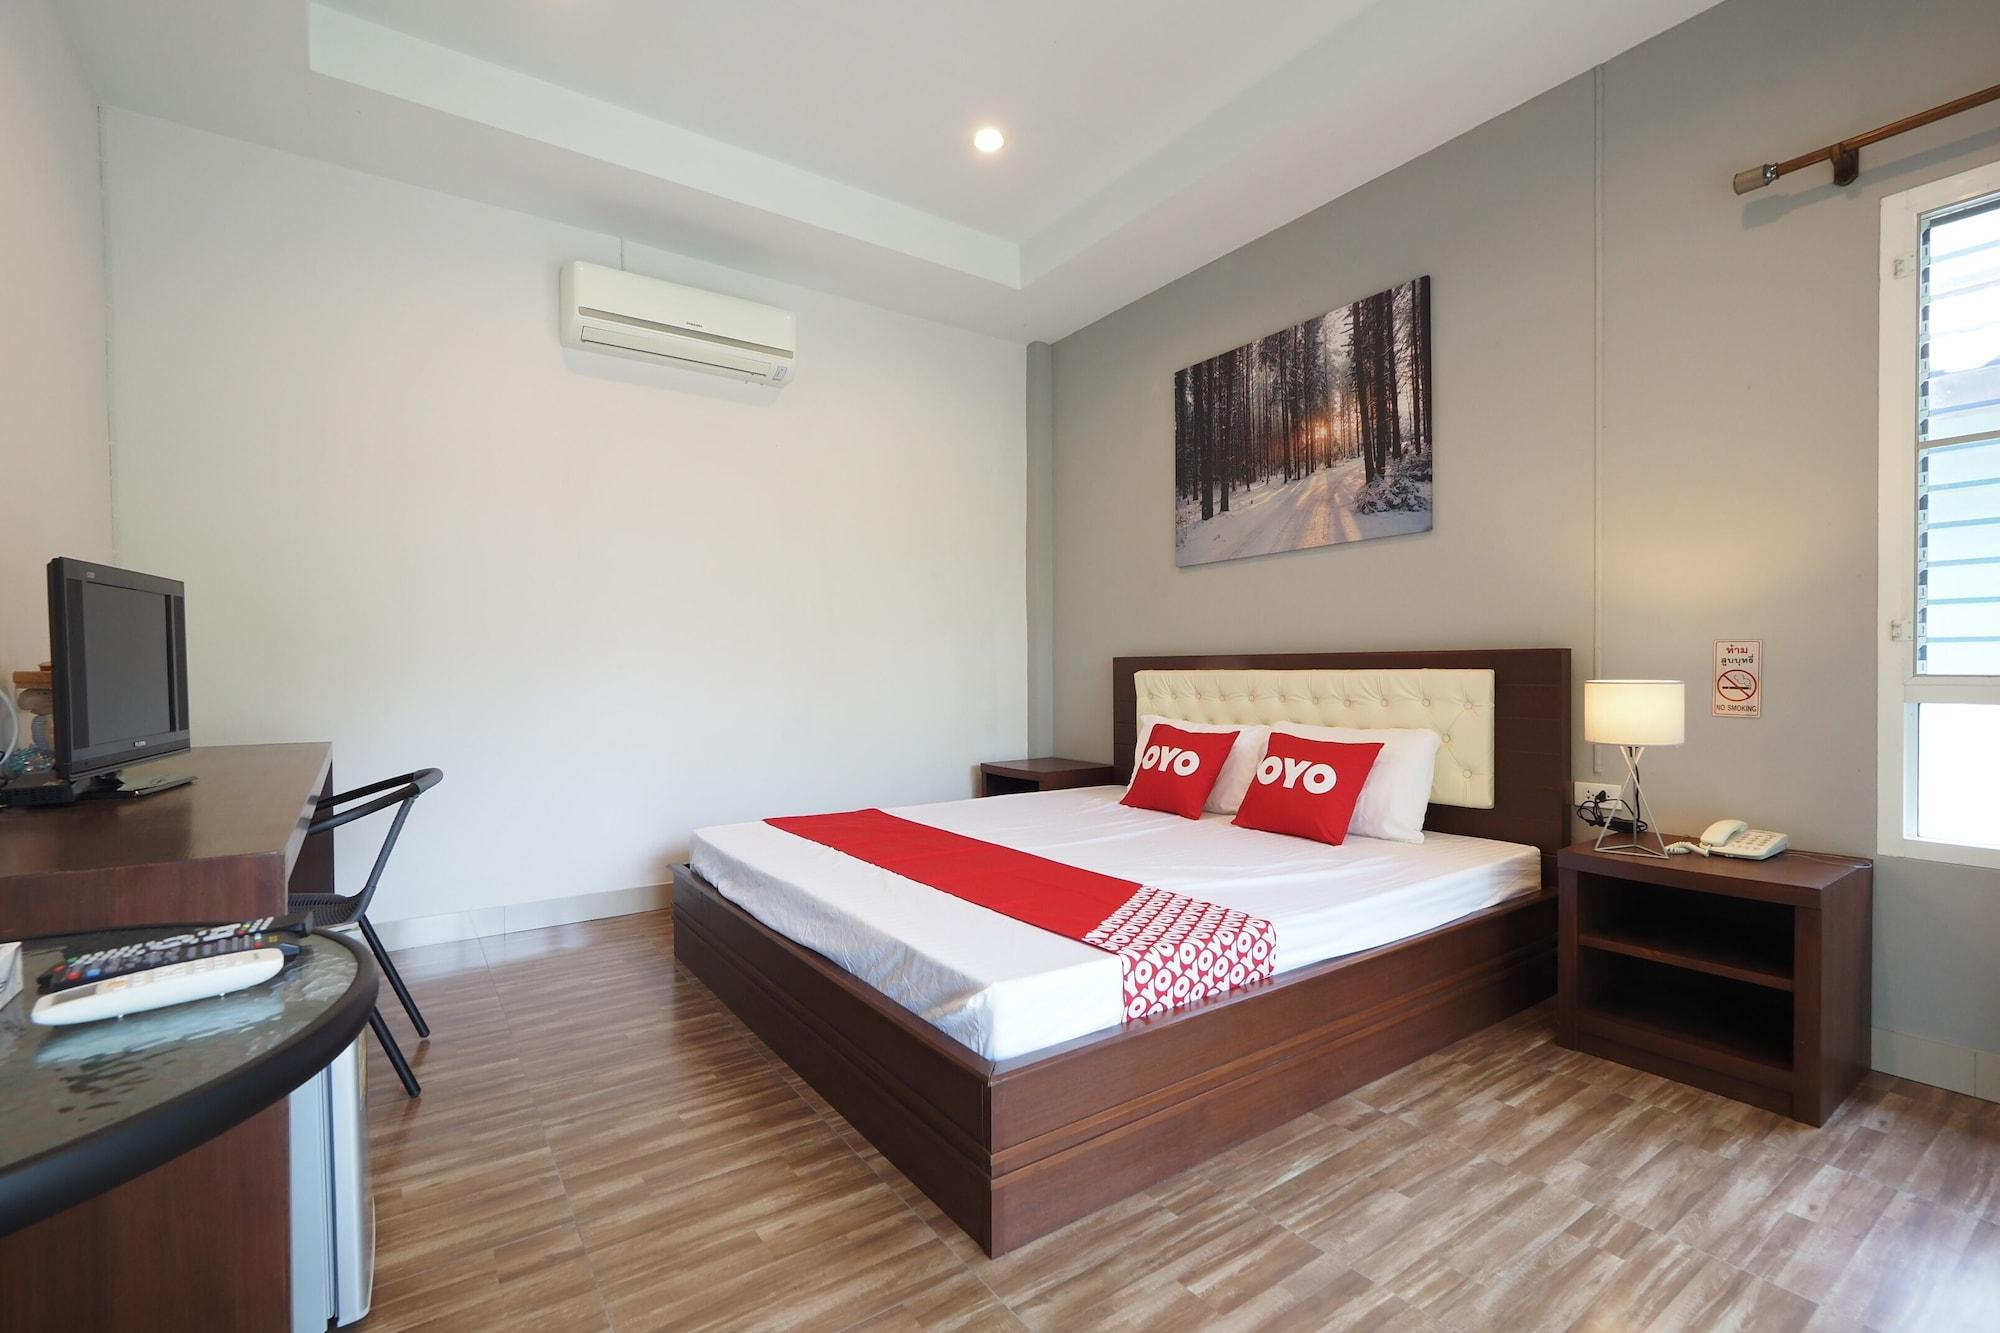 OYO 733 T Resort, Muang Suphanburi